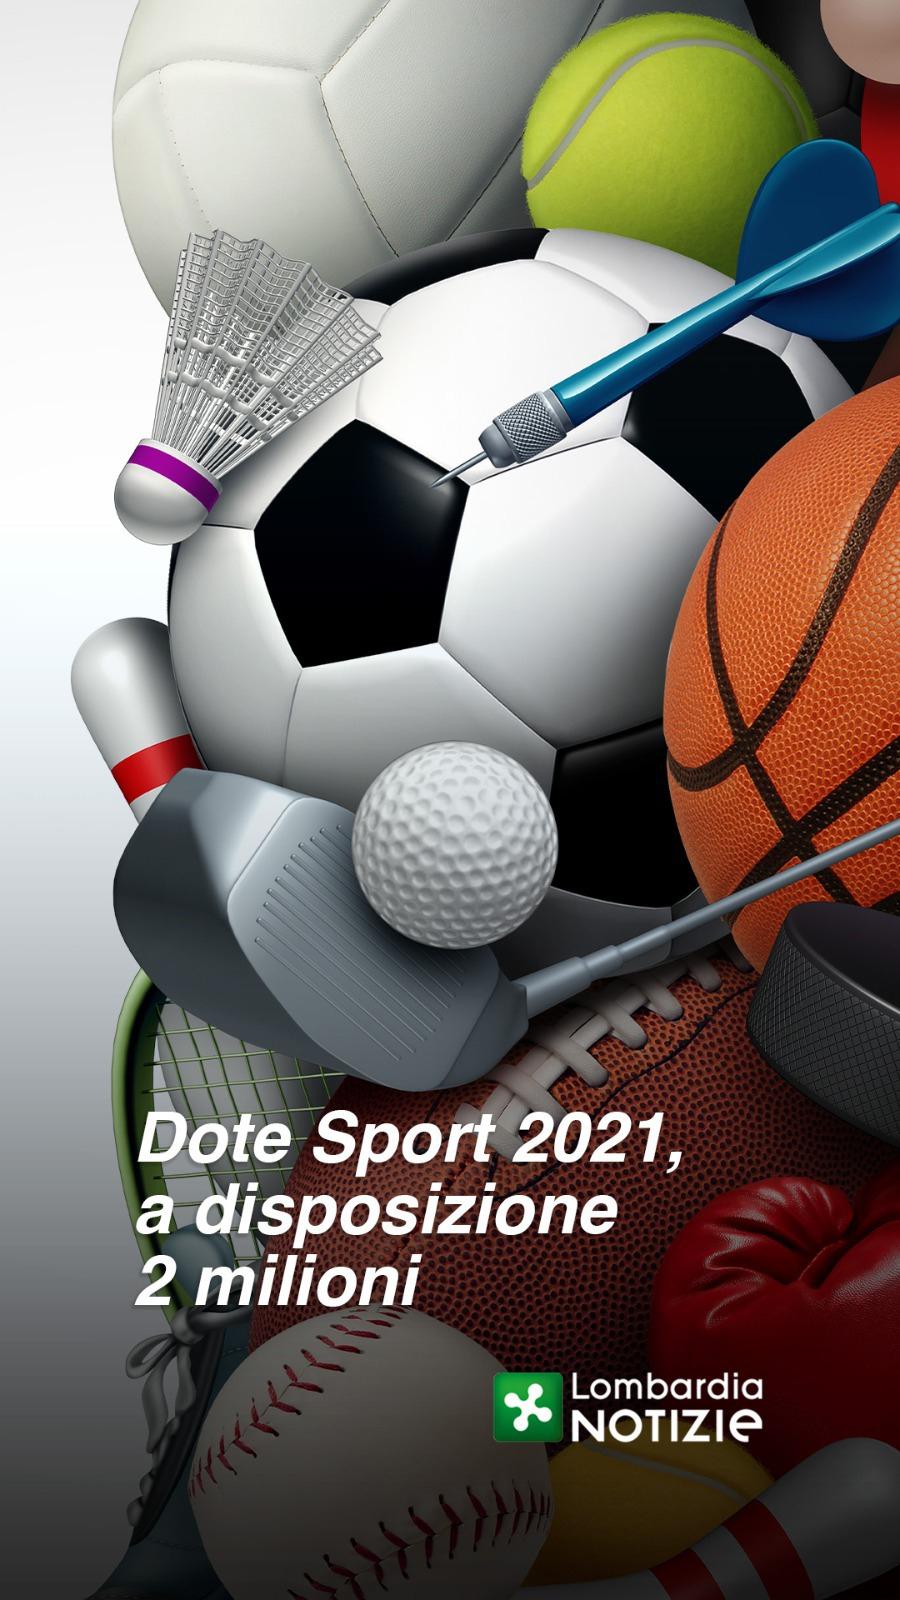 Dote Sport 2021